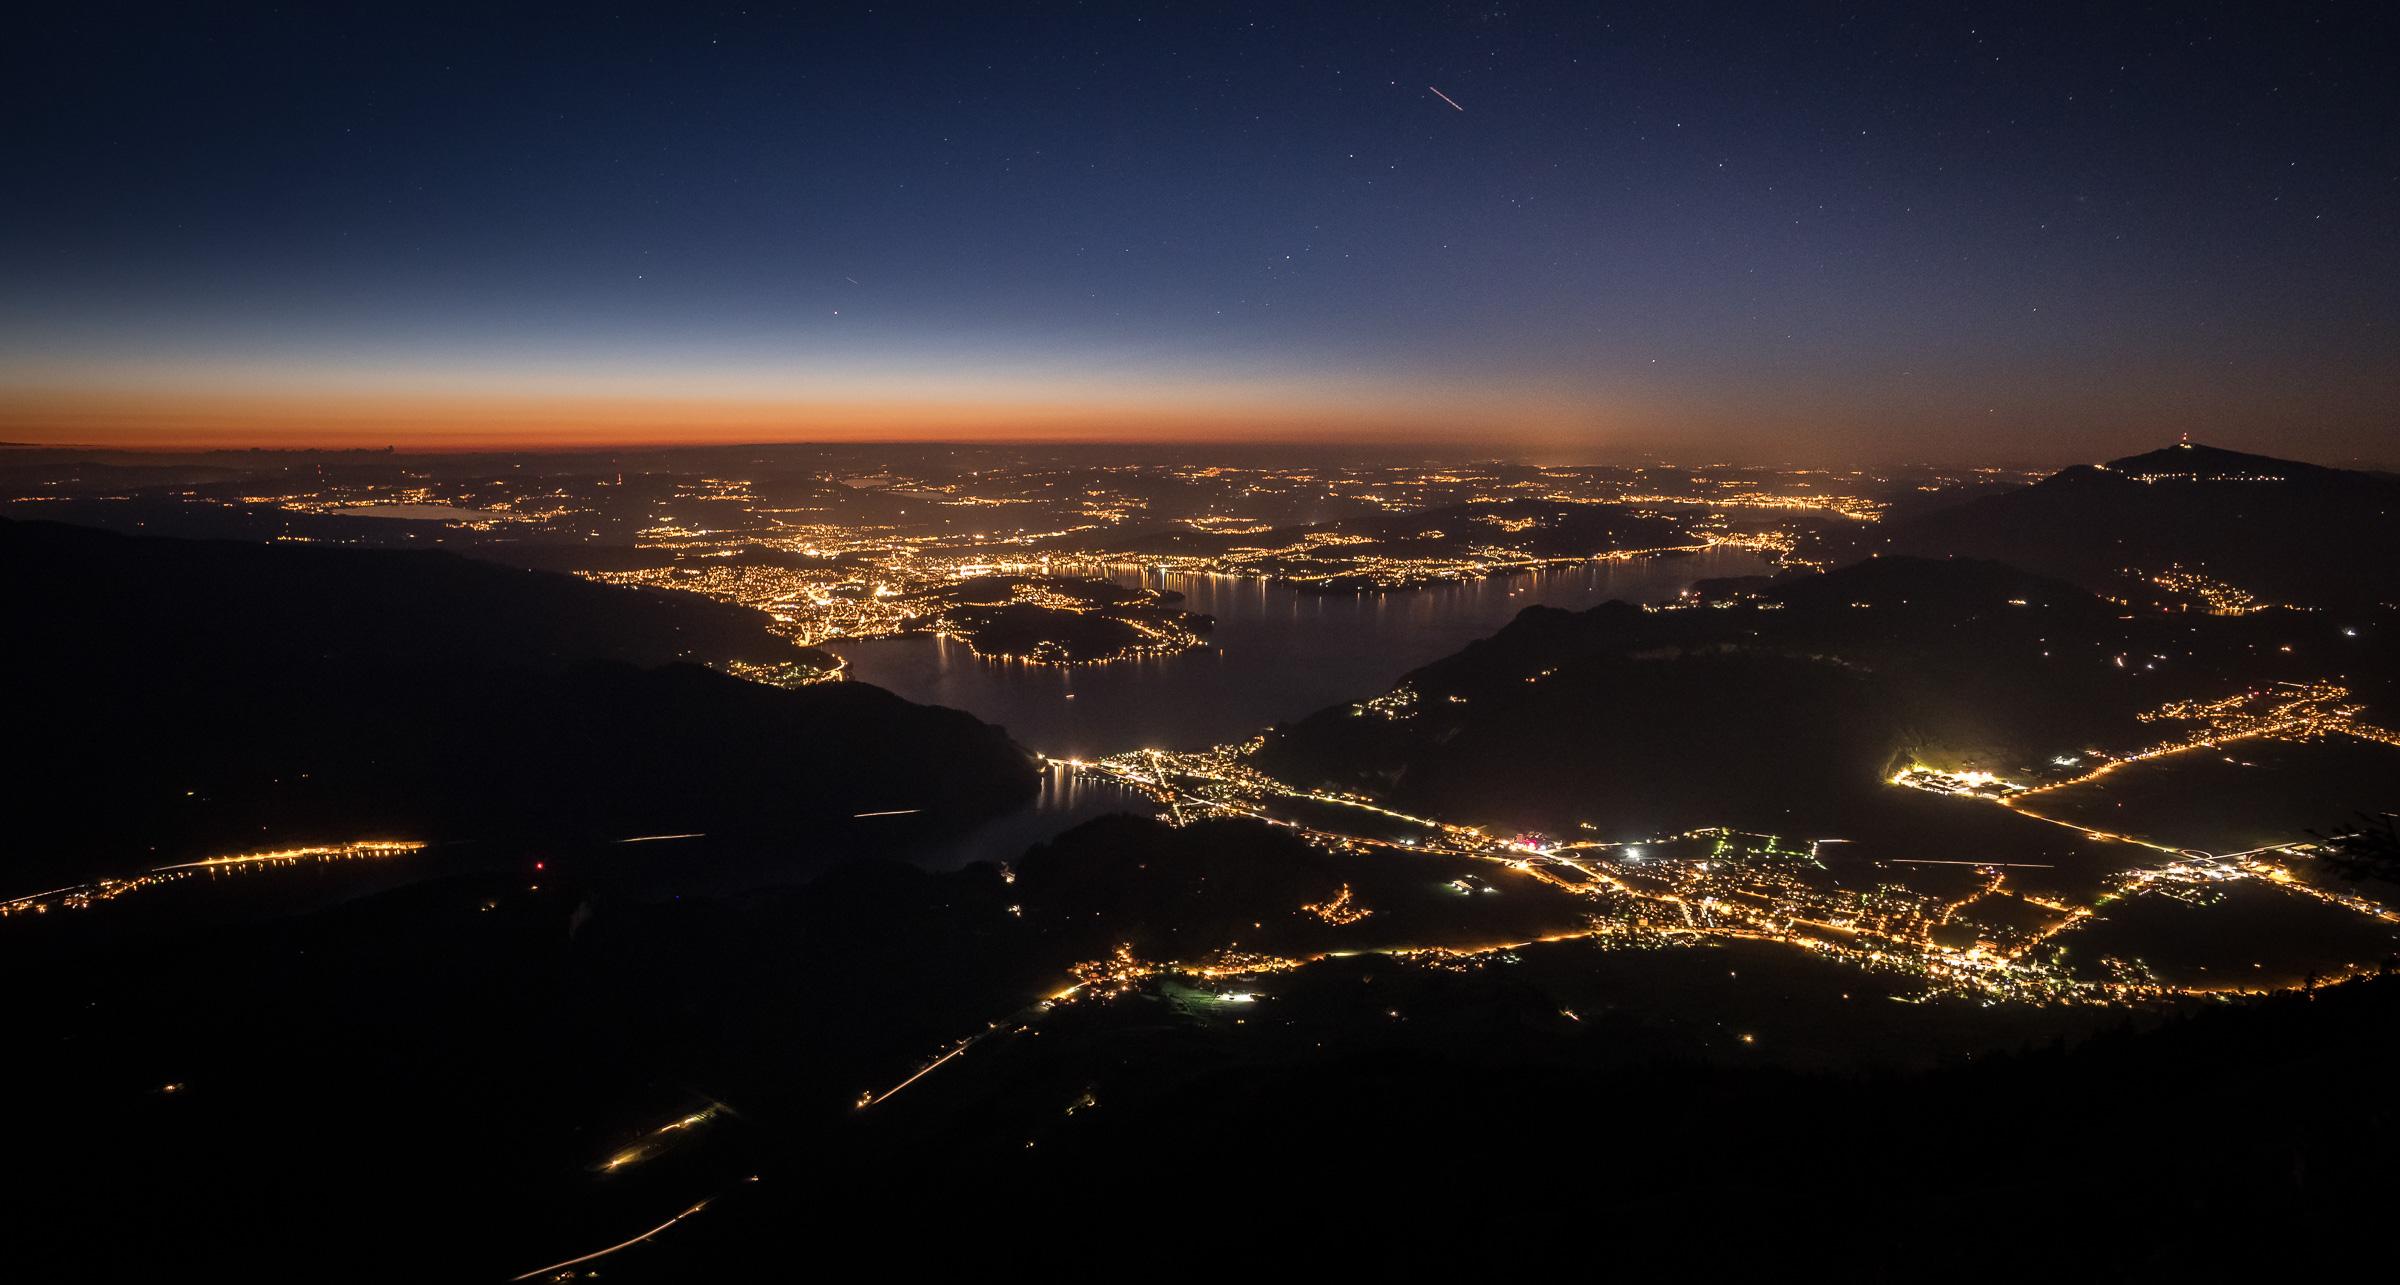 Kurs Nachtfotografie